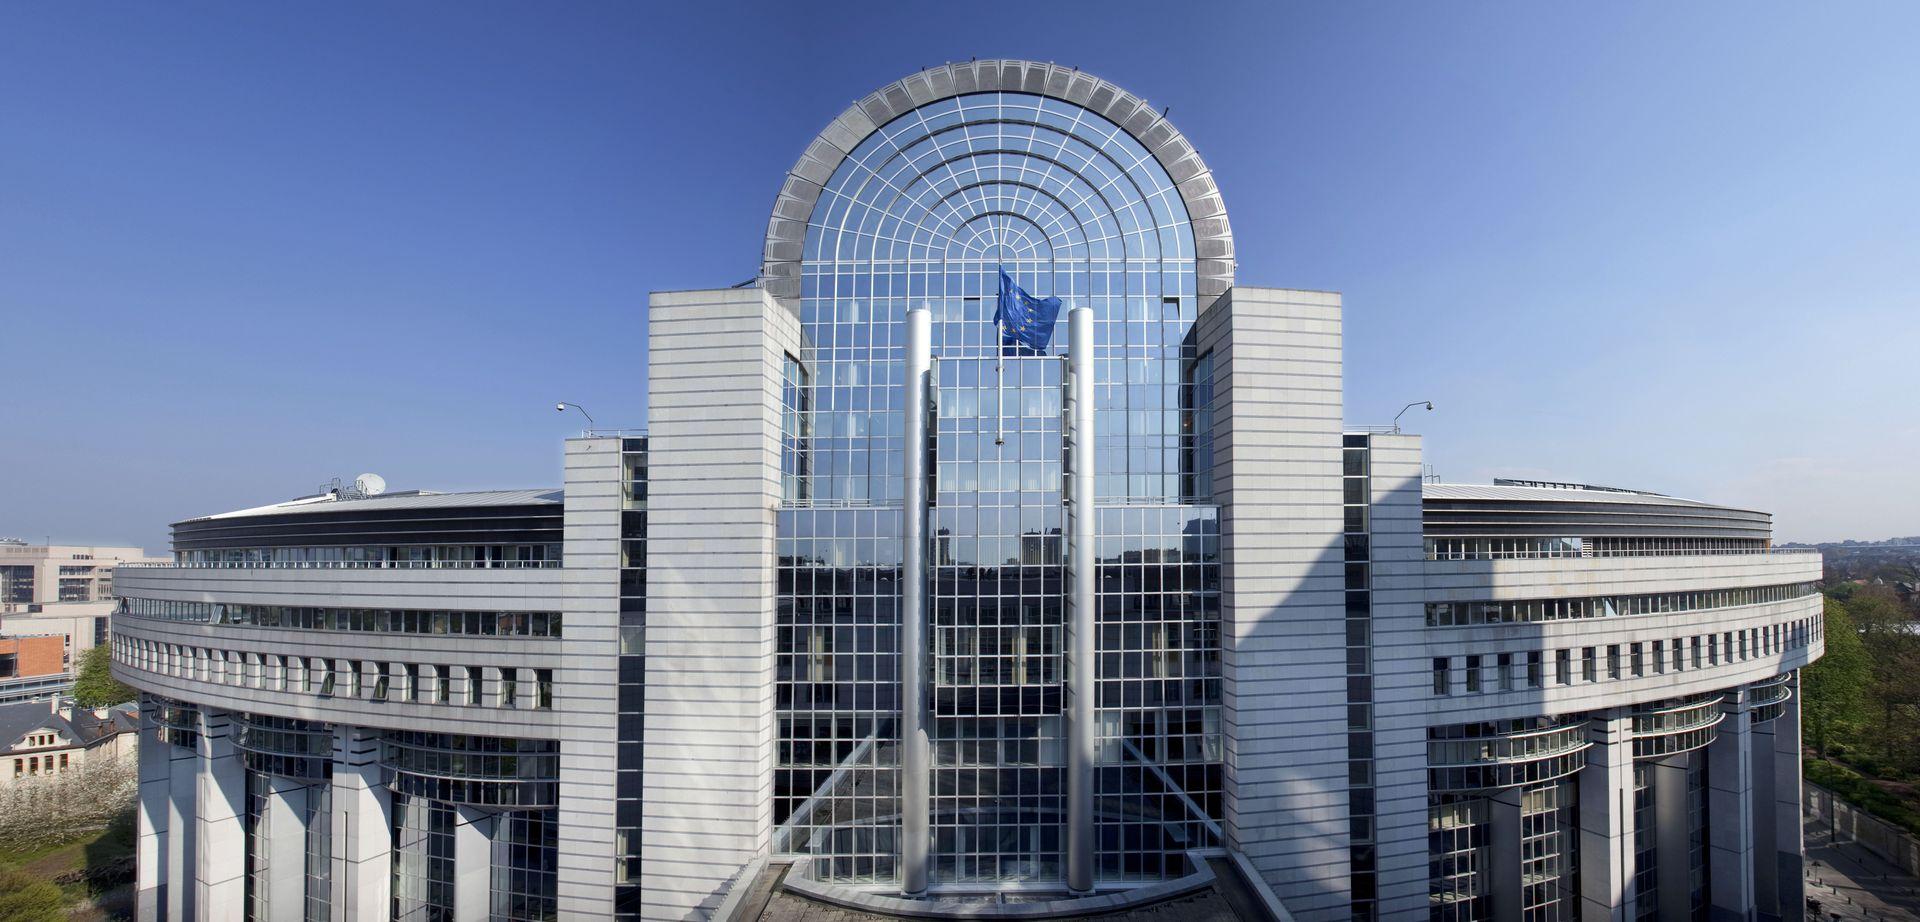 Visita al parlamento europeo dal 19 al 21 10 2015 laura for Parlamento sede